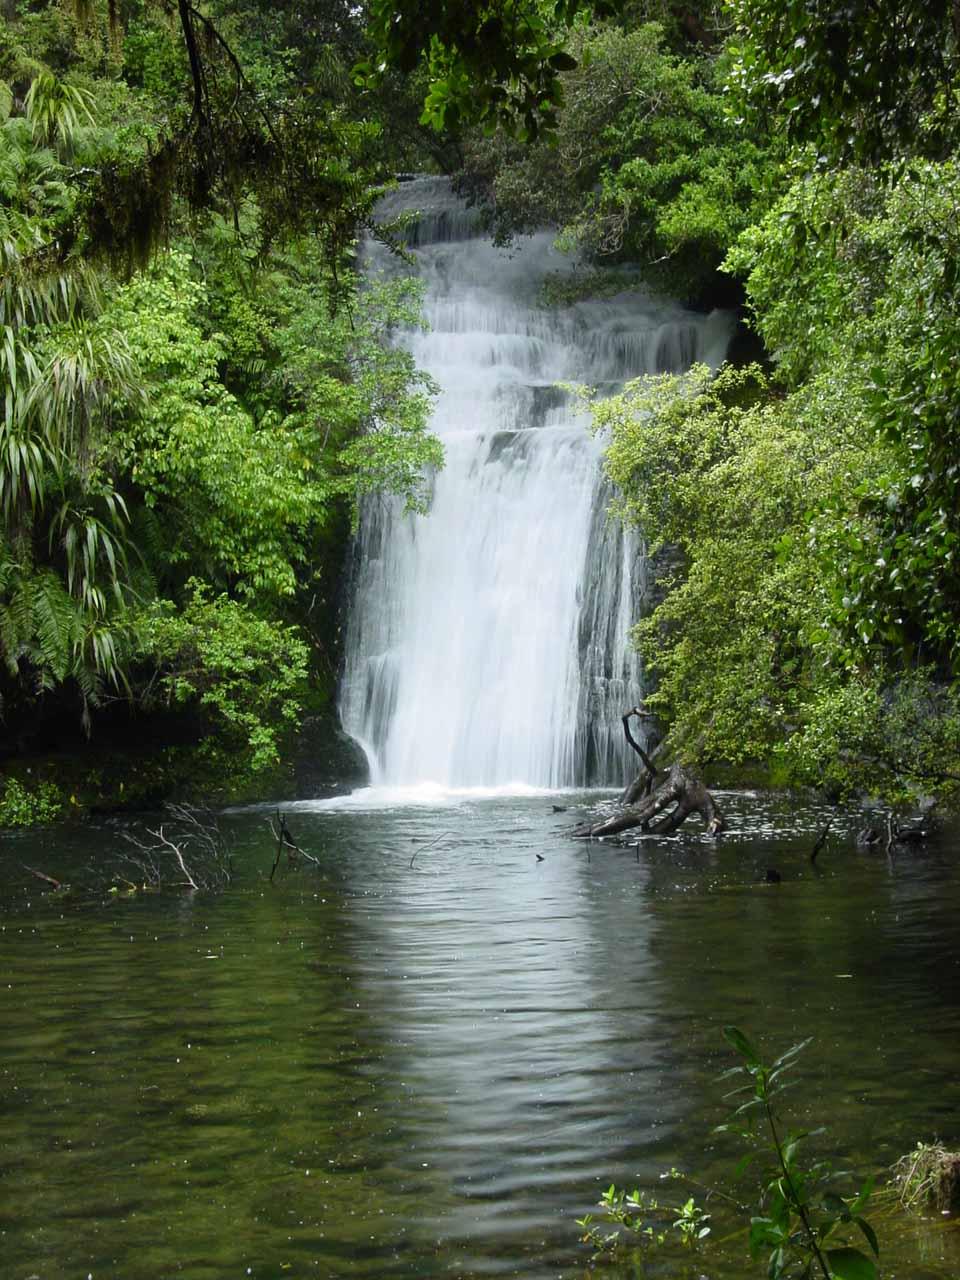 The Bridal Veil Falls near the Aniwaniwa Visitor Centre